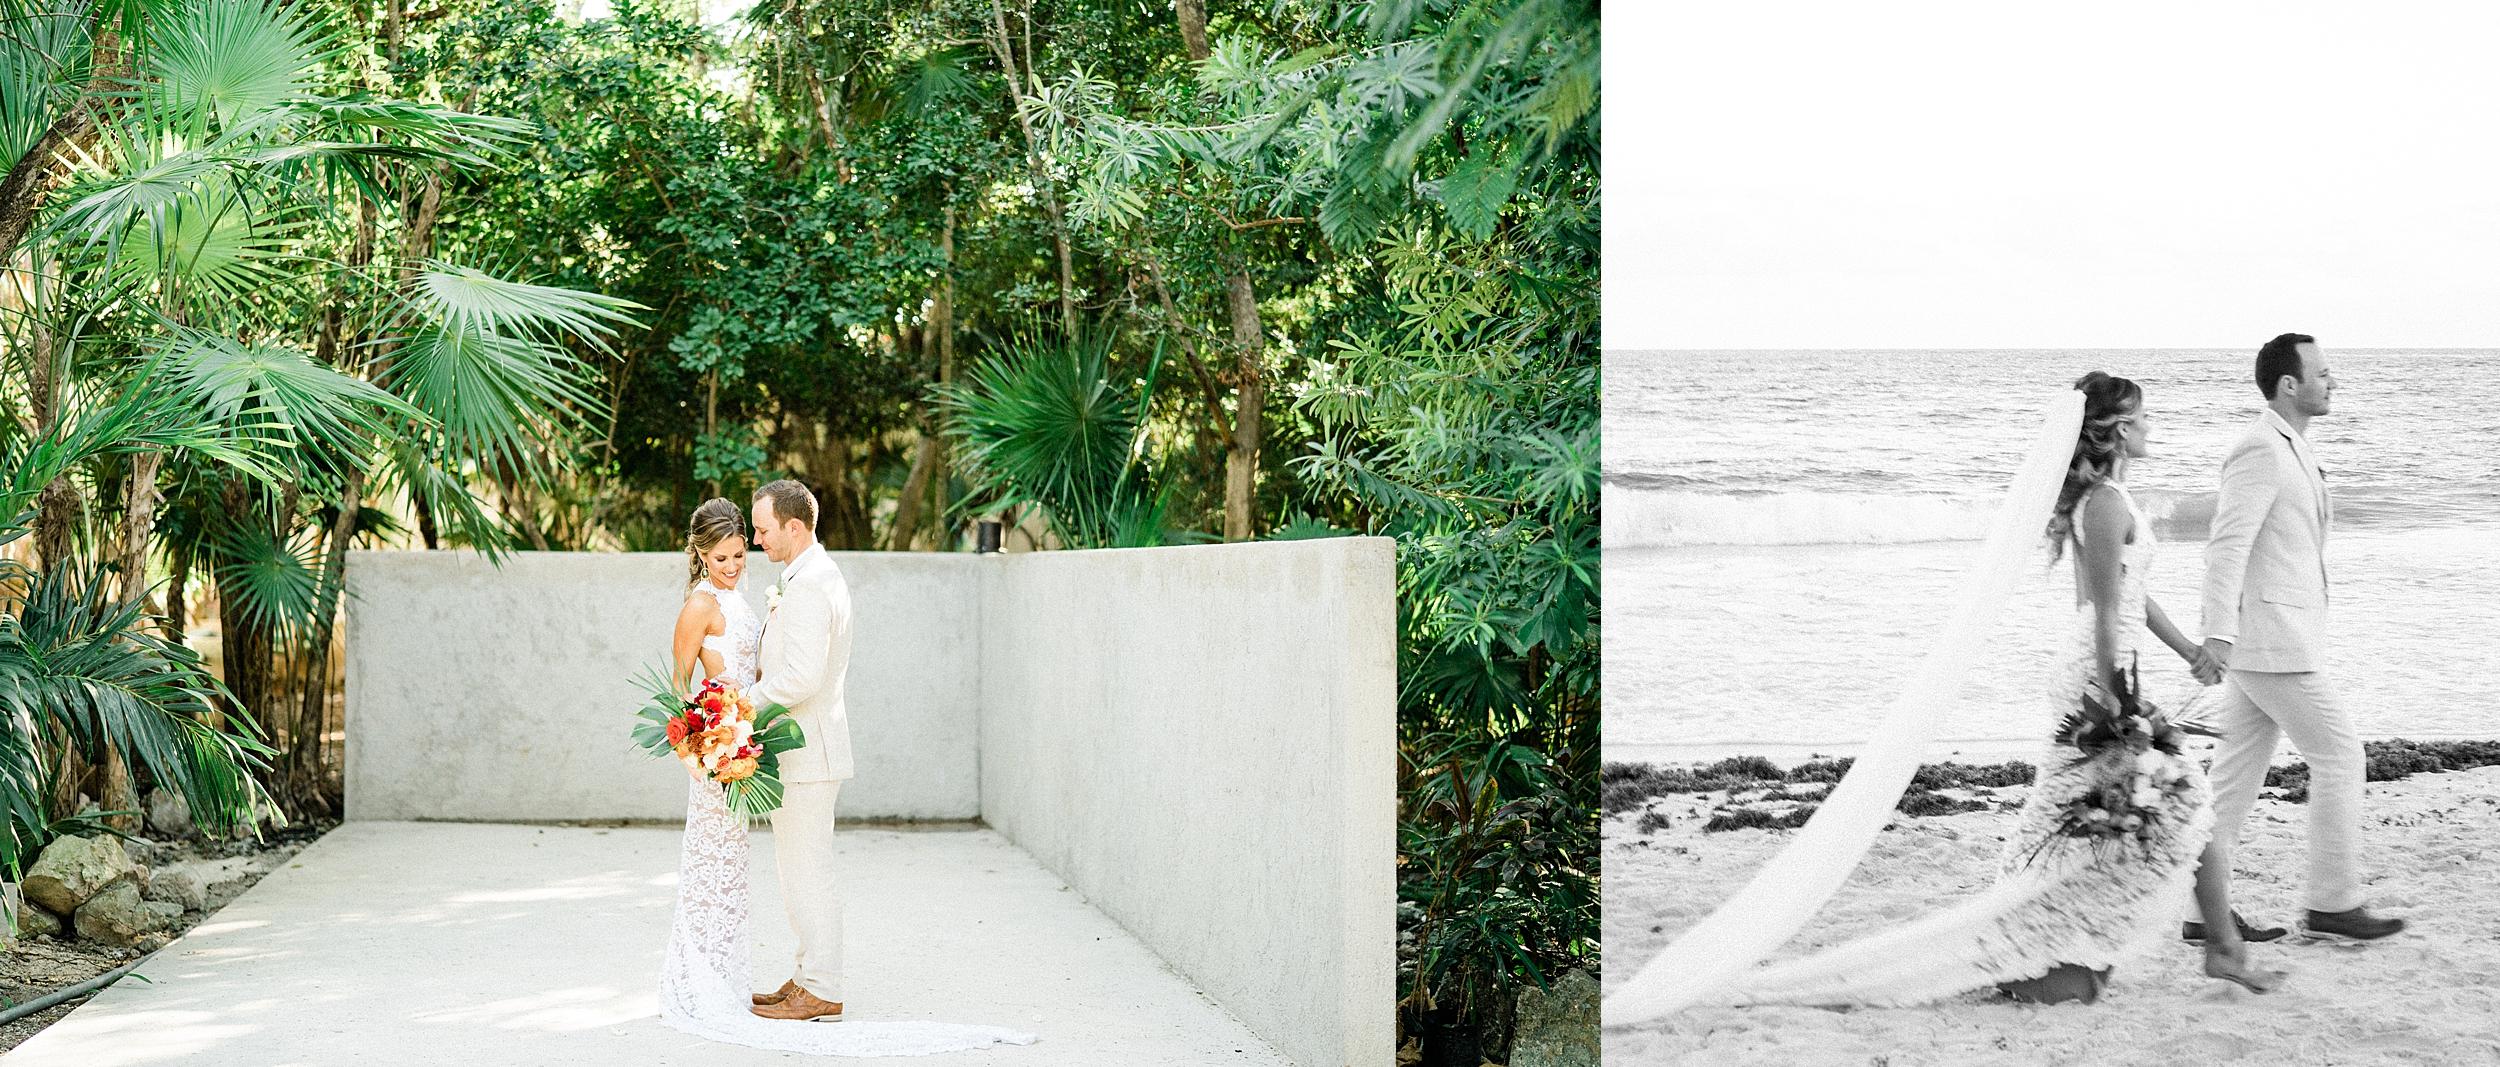 Destination Tulum Akiin Beach Wedding Stewart and Connie Photography_0017.jpg